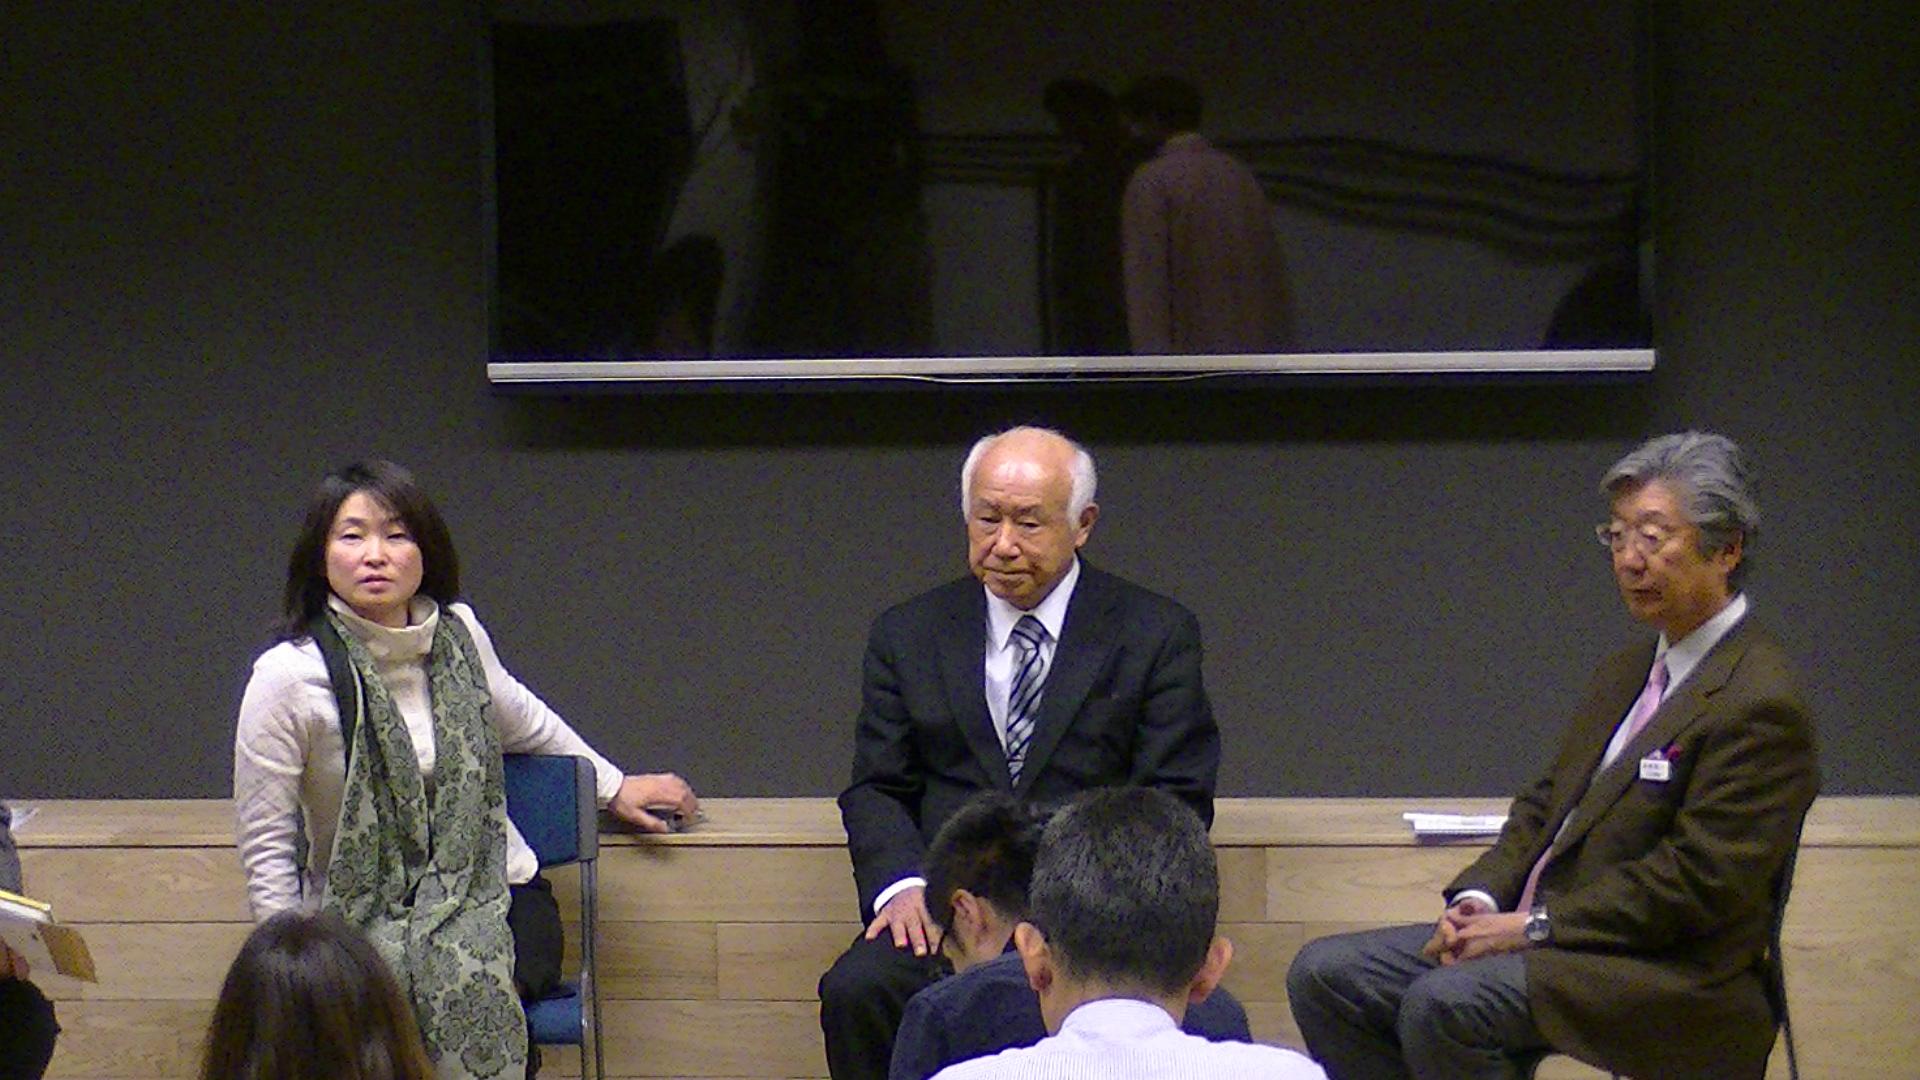 PIC 0542 - 4月1日東京思風塾の開催になります。